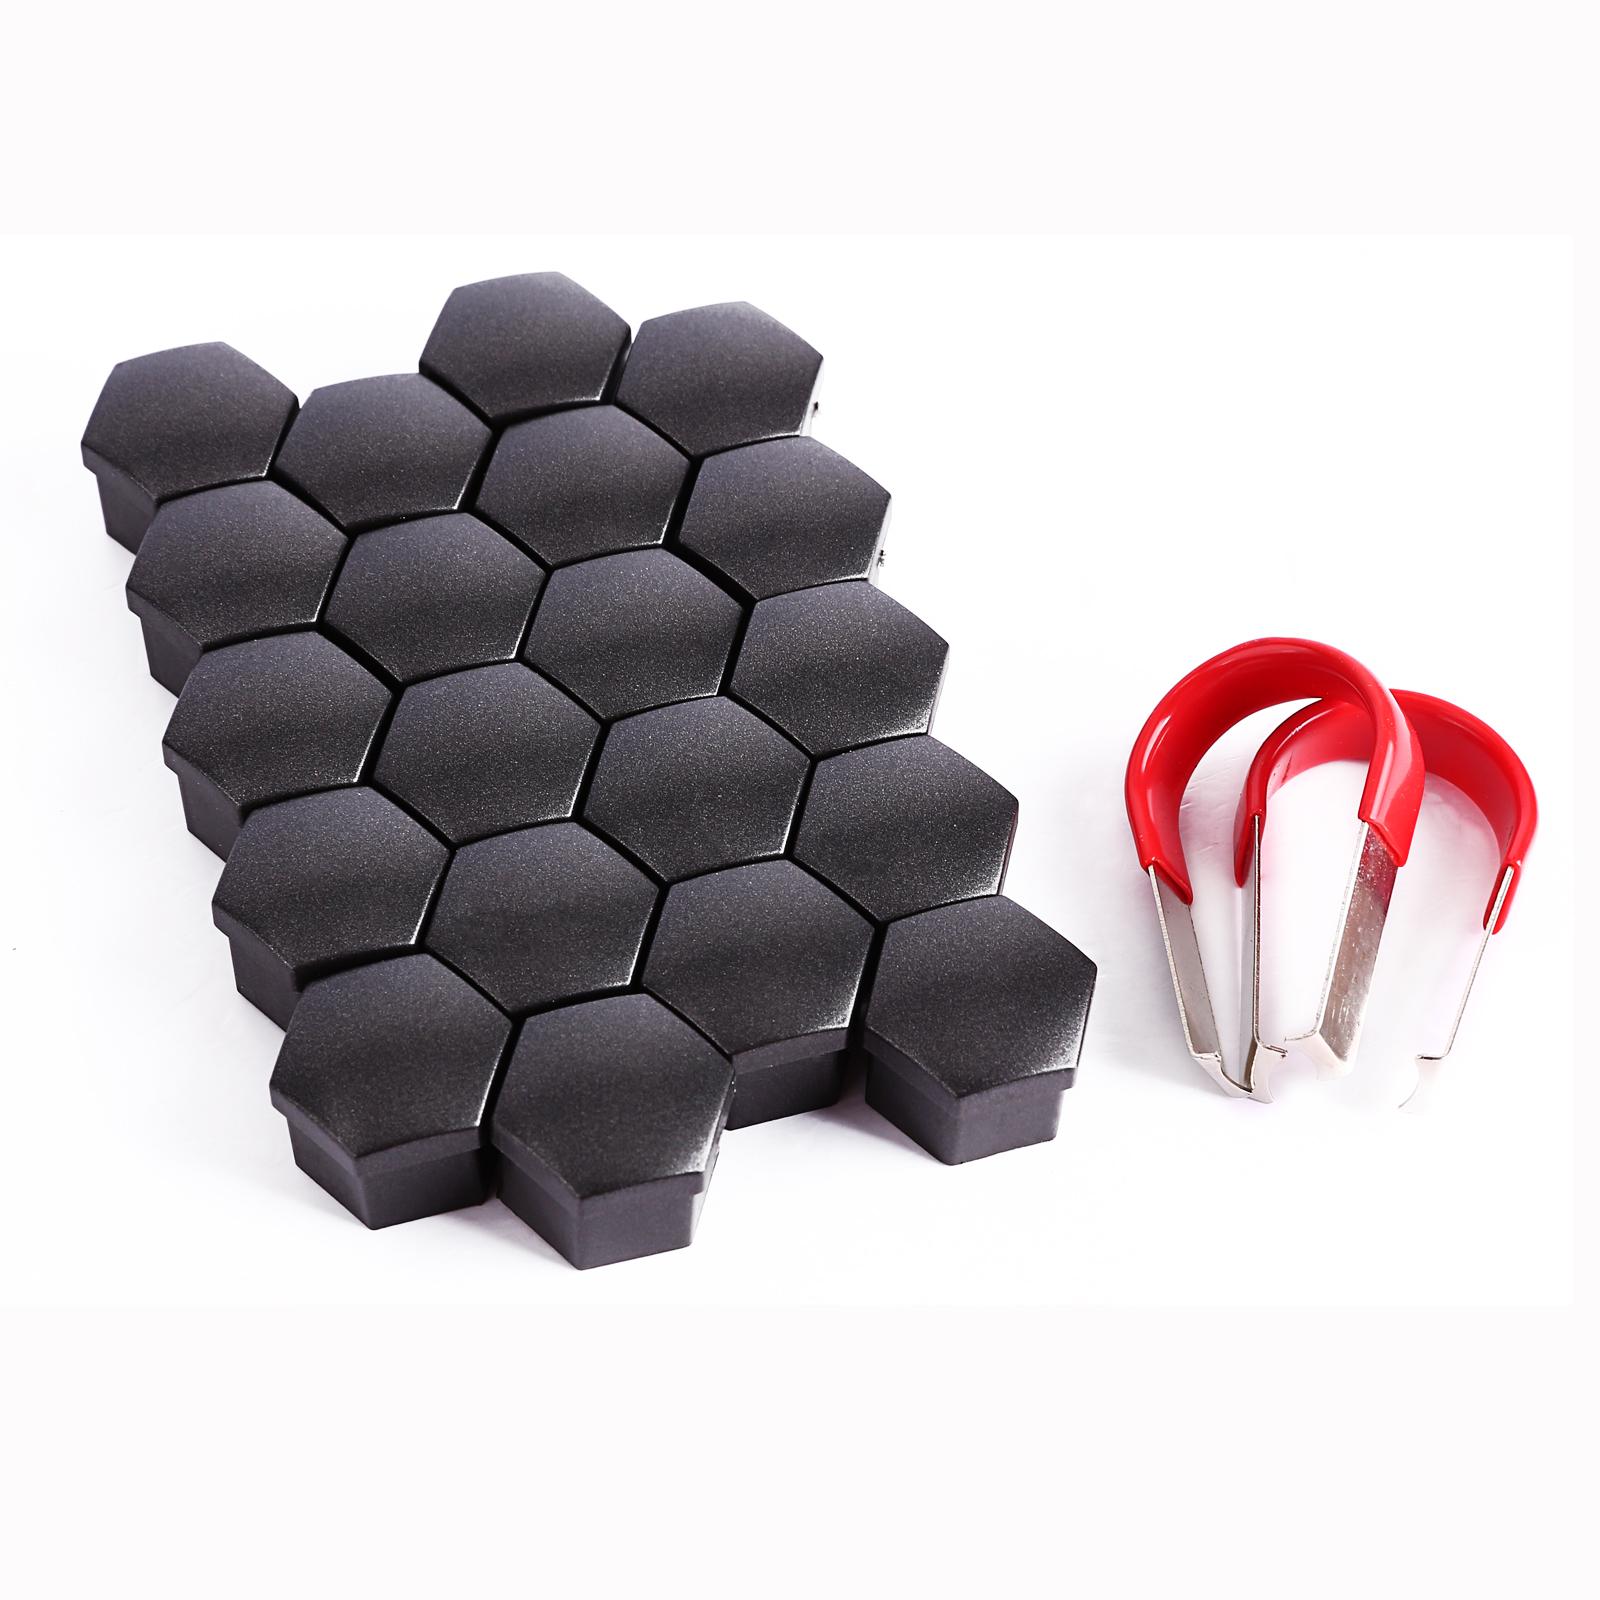 20x alloy wheel nut caps bolt covers vauxhall volvo saab peugeot citroen vw 19mm ebay. Black Bedroom Furniture Sets. Home Design Ideas